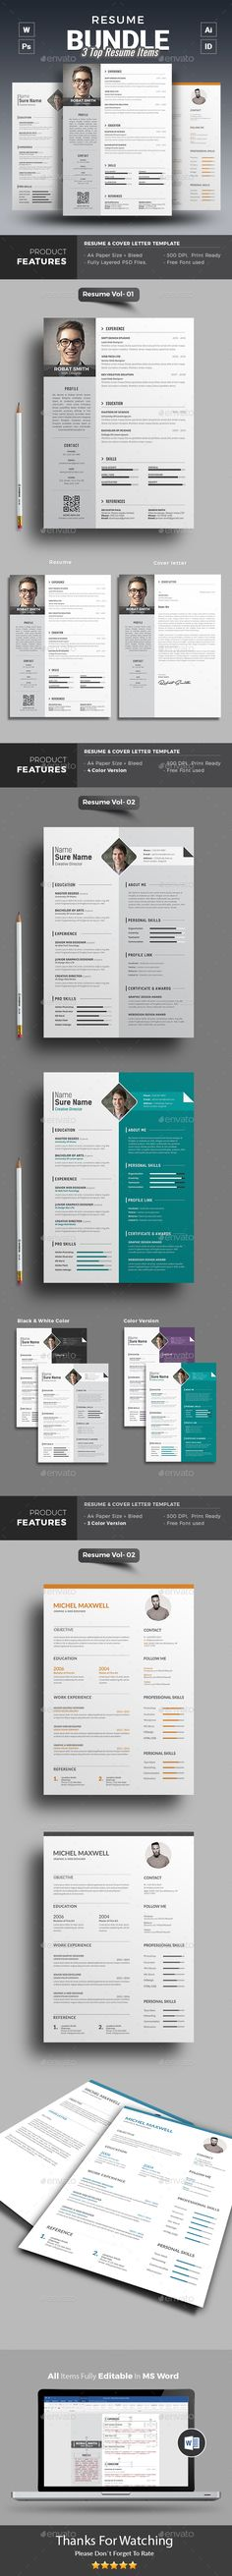 Dynamic Style ResumeCV Multi Color